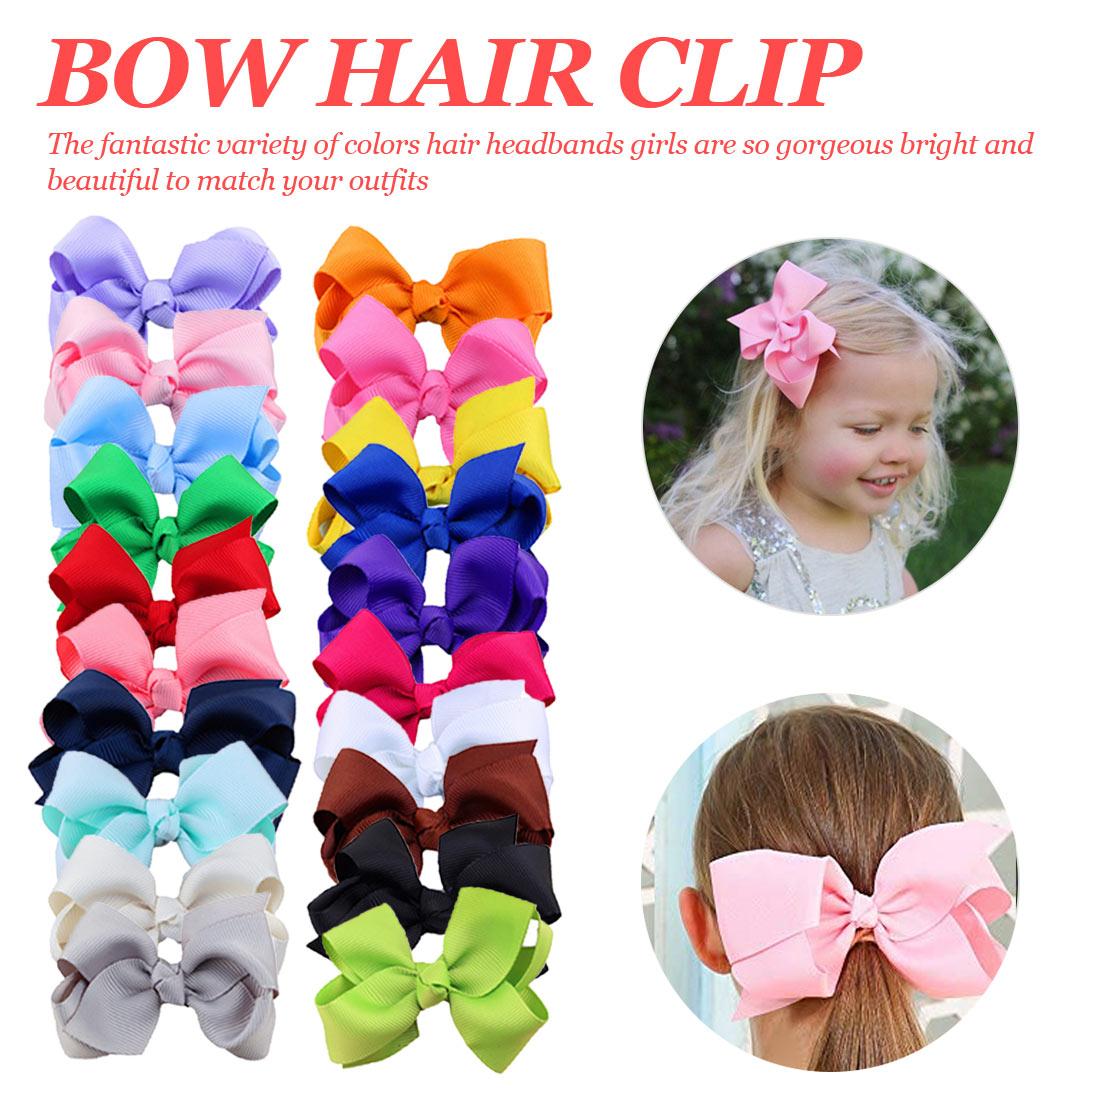 Kids Girls Hair Bows Brand Fashion Boutique Alligator Clip Grosgrain Ribbon Candy Color Headband